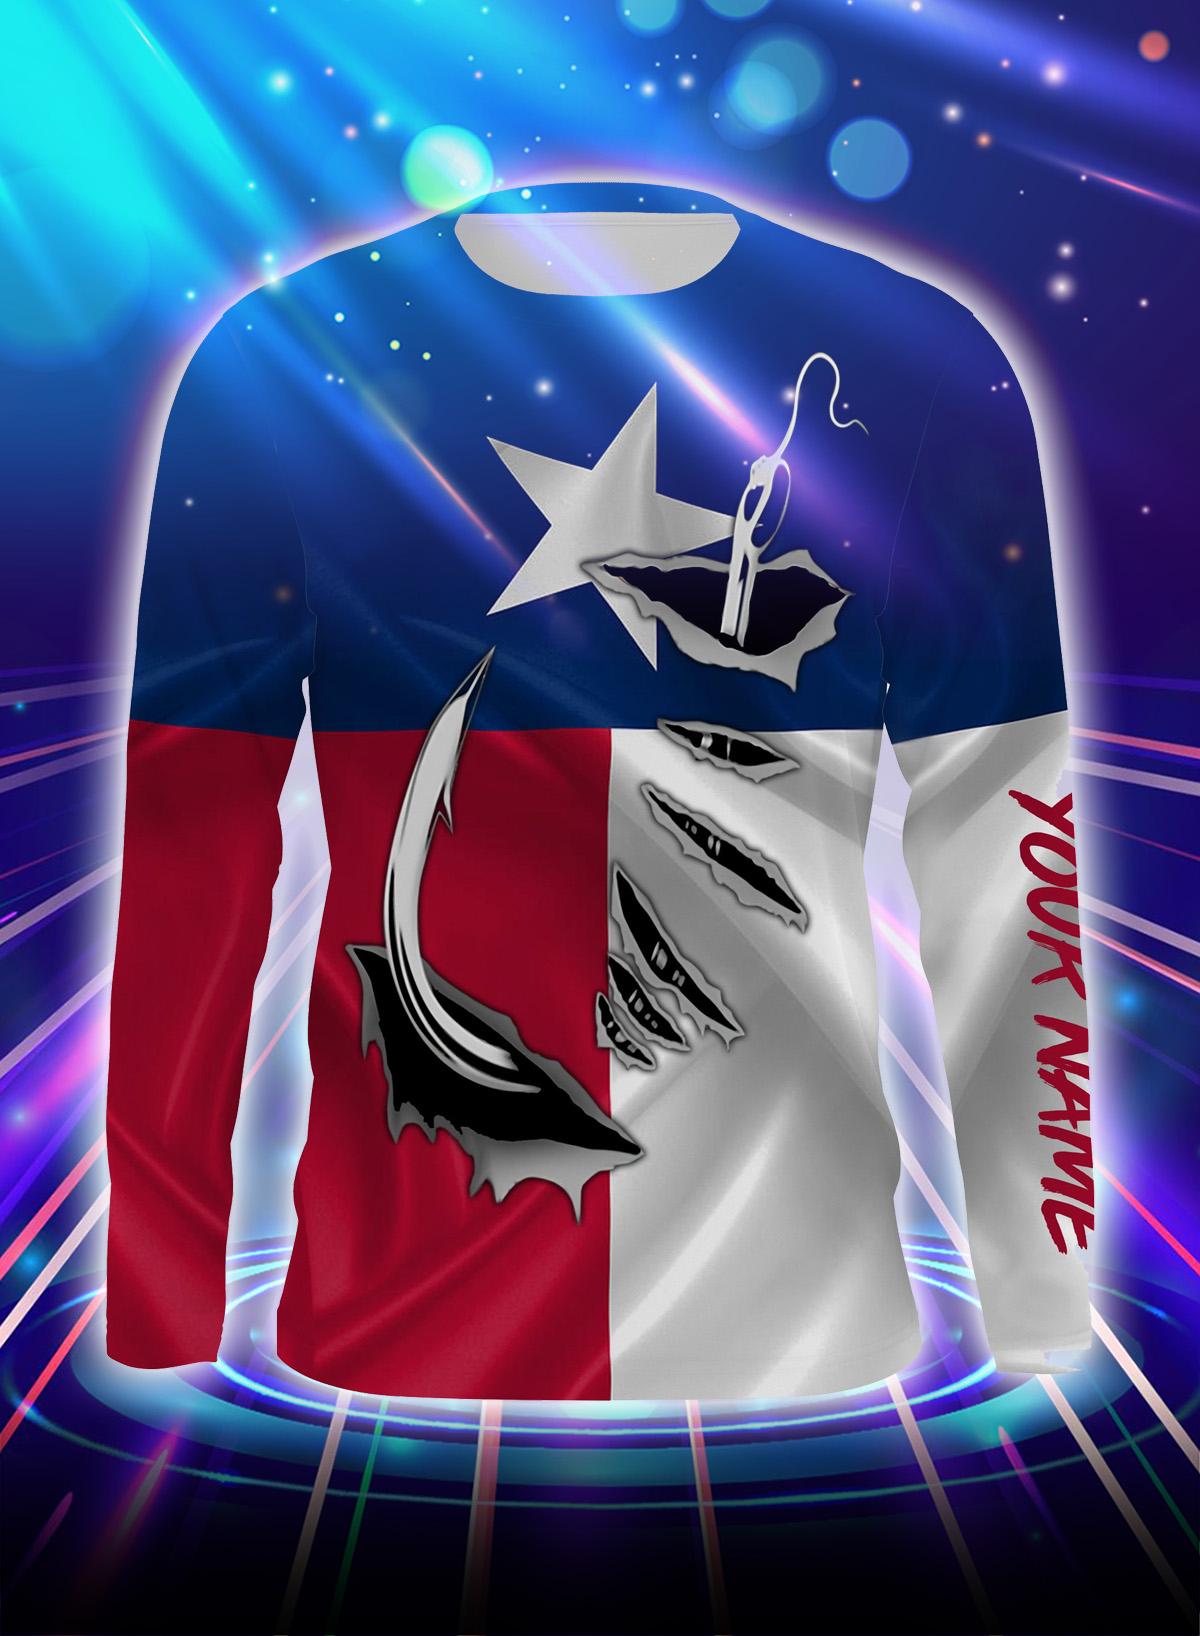 Fishing 3d fish hook texas flag personalized customize name long sleeve shirt, sweatshirt